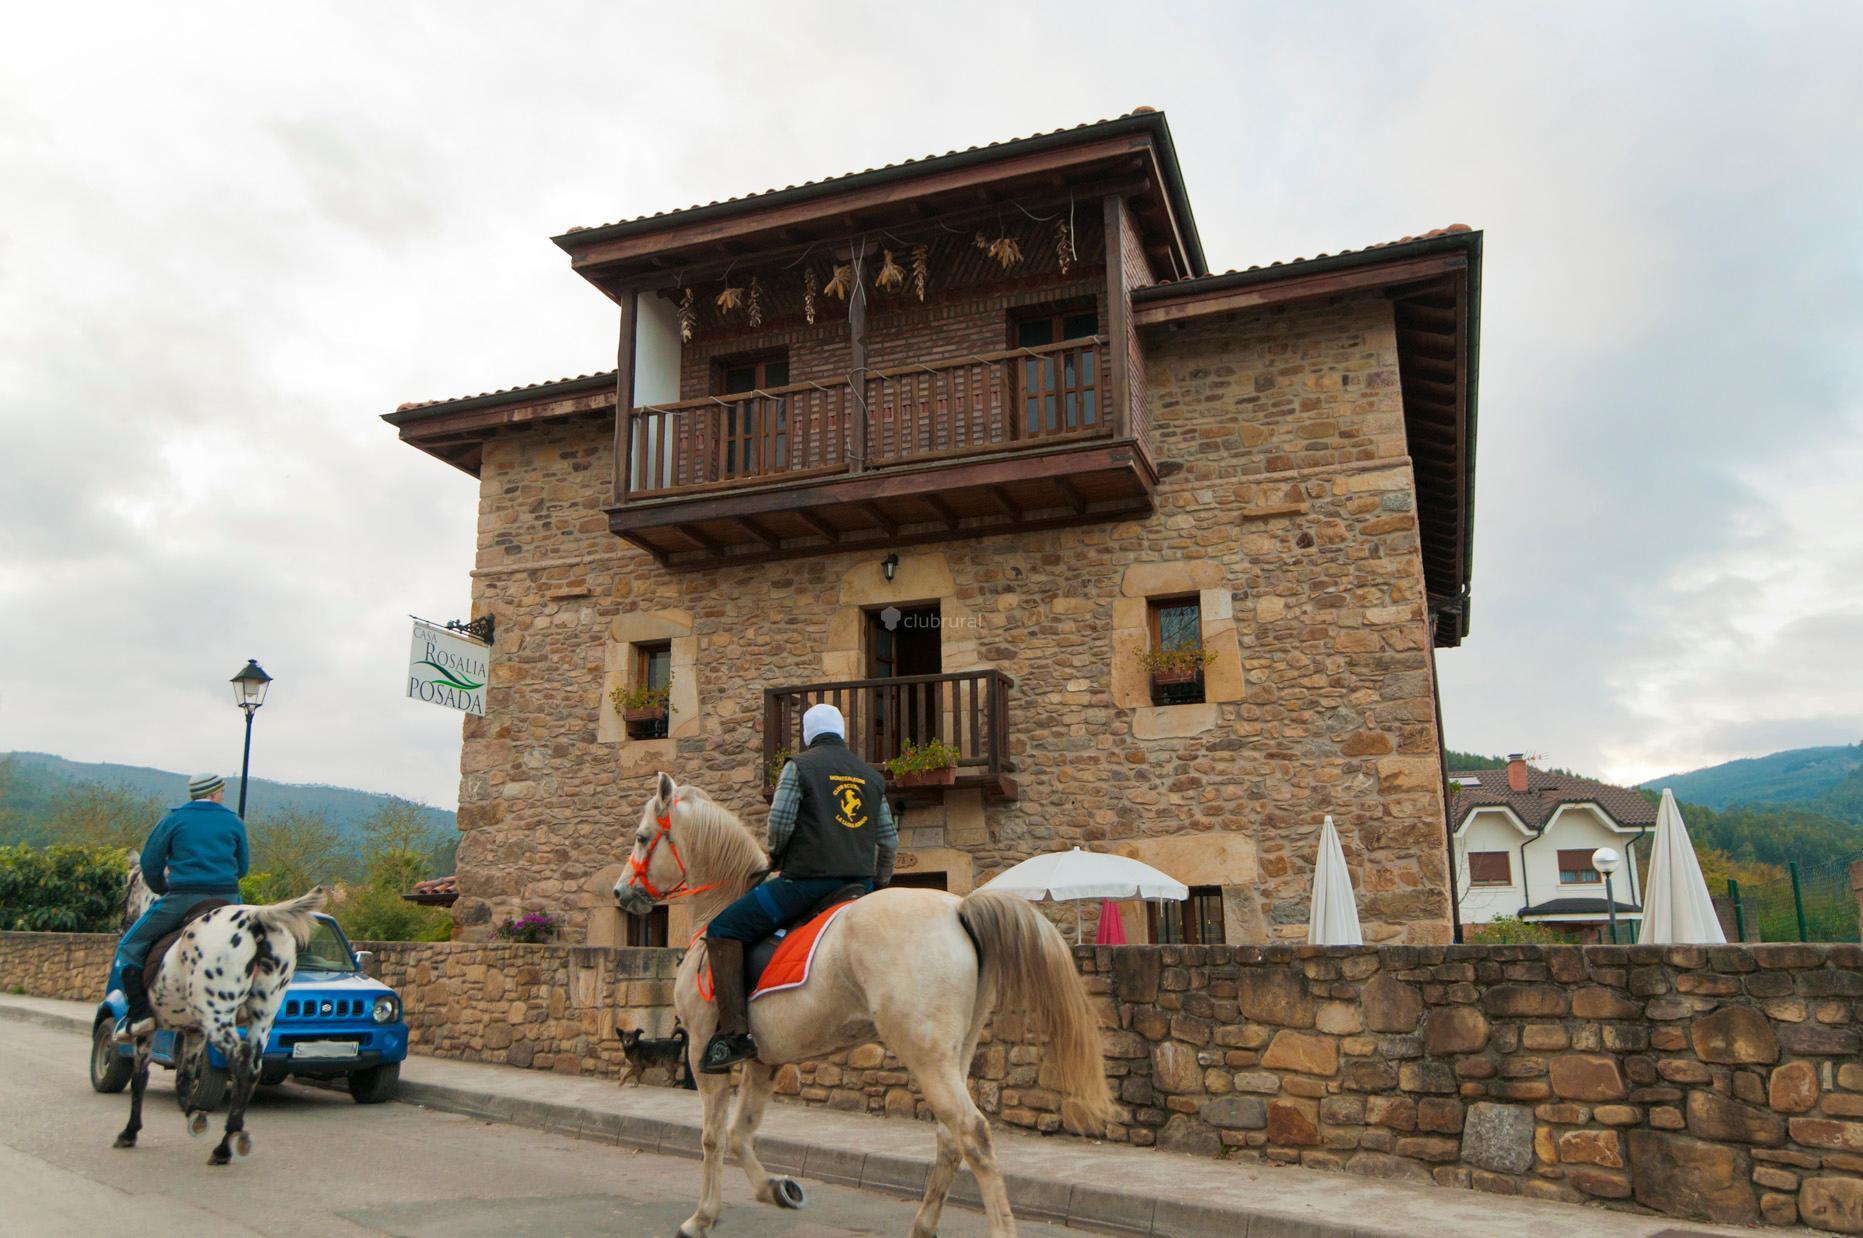 Fotos de posada casa rosalia cantabria castro urdiales clubrural - Posada casa rosalia ...